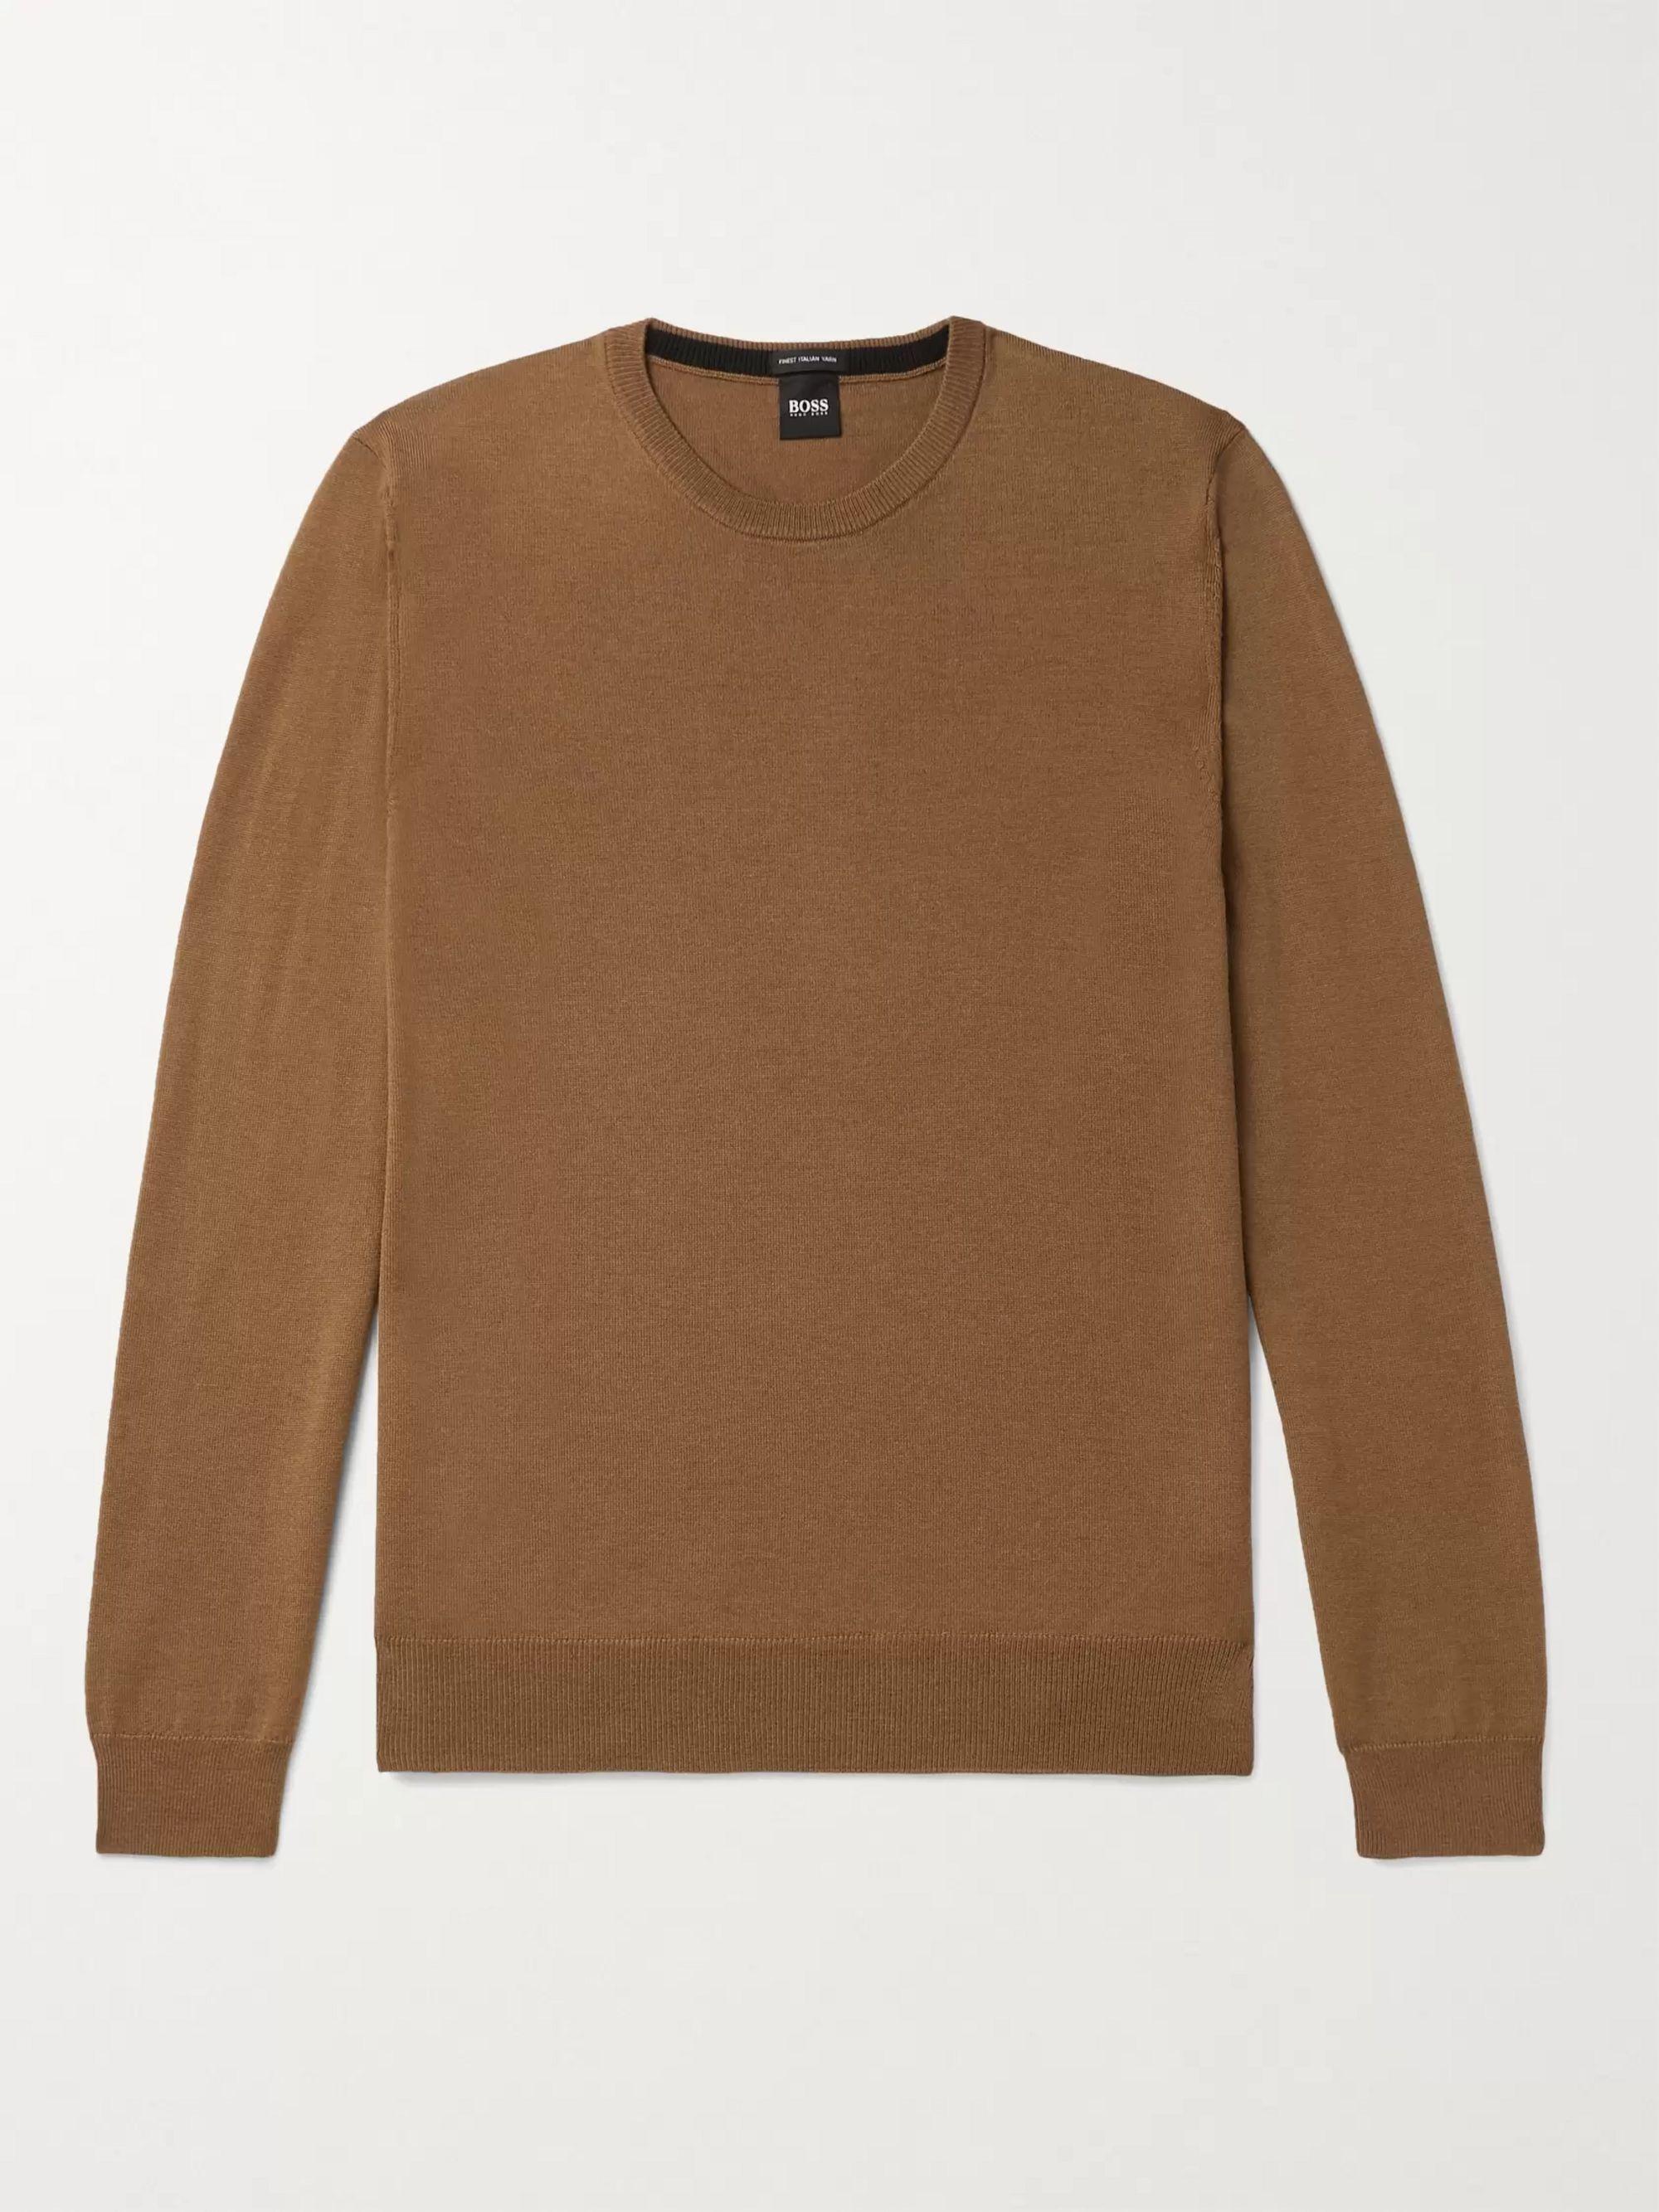 HUGO BOSS Virgin Wool Sweater